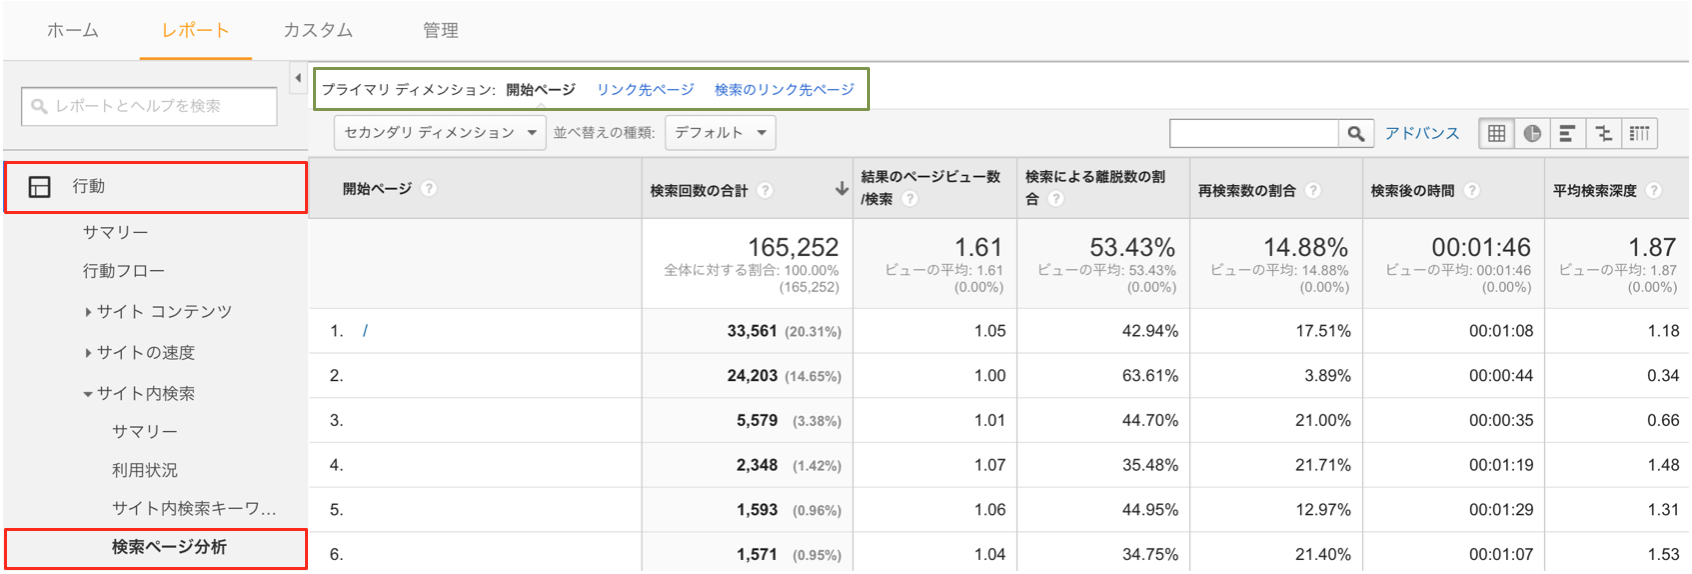 Googleアナリティクスの検索ページ分析レポート